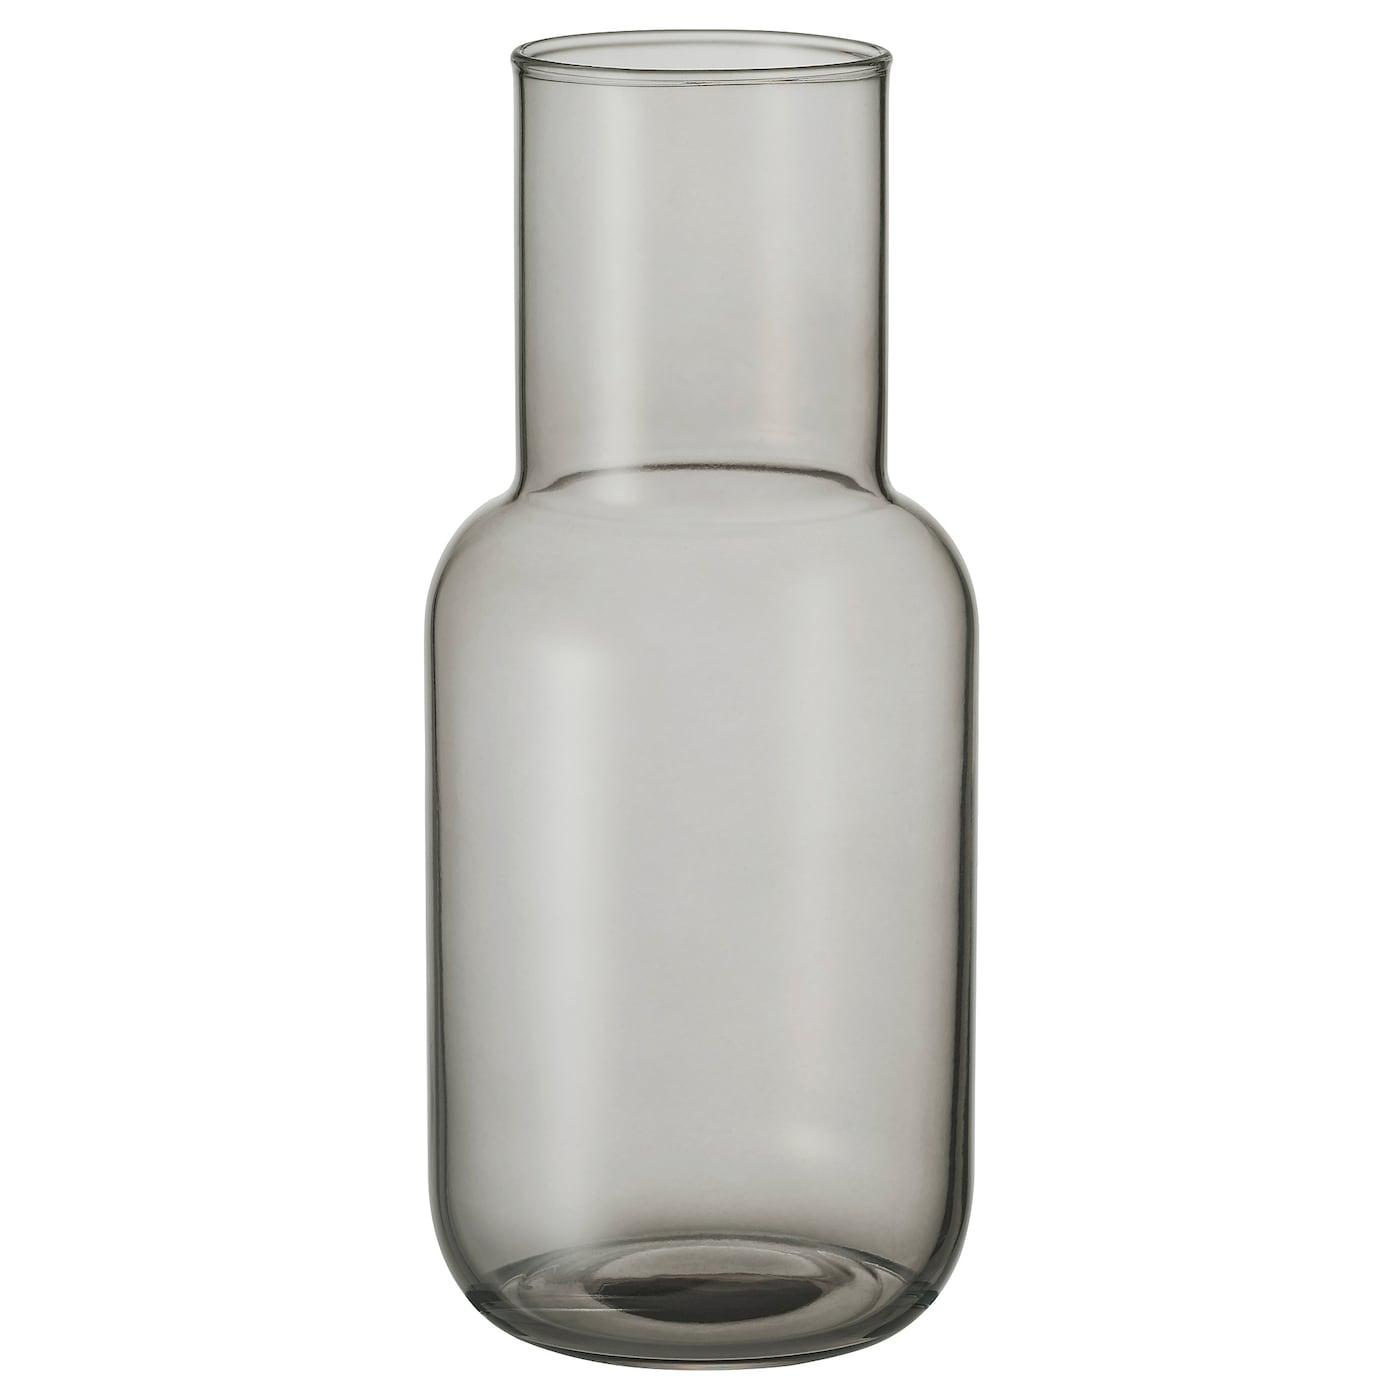 FÖRENLIG フォーレンリグ 花瓶